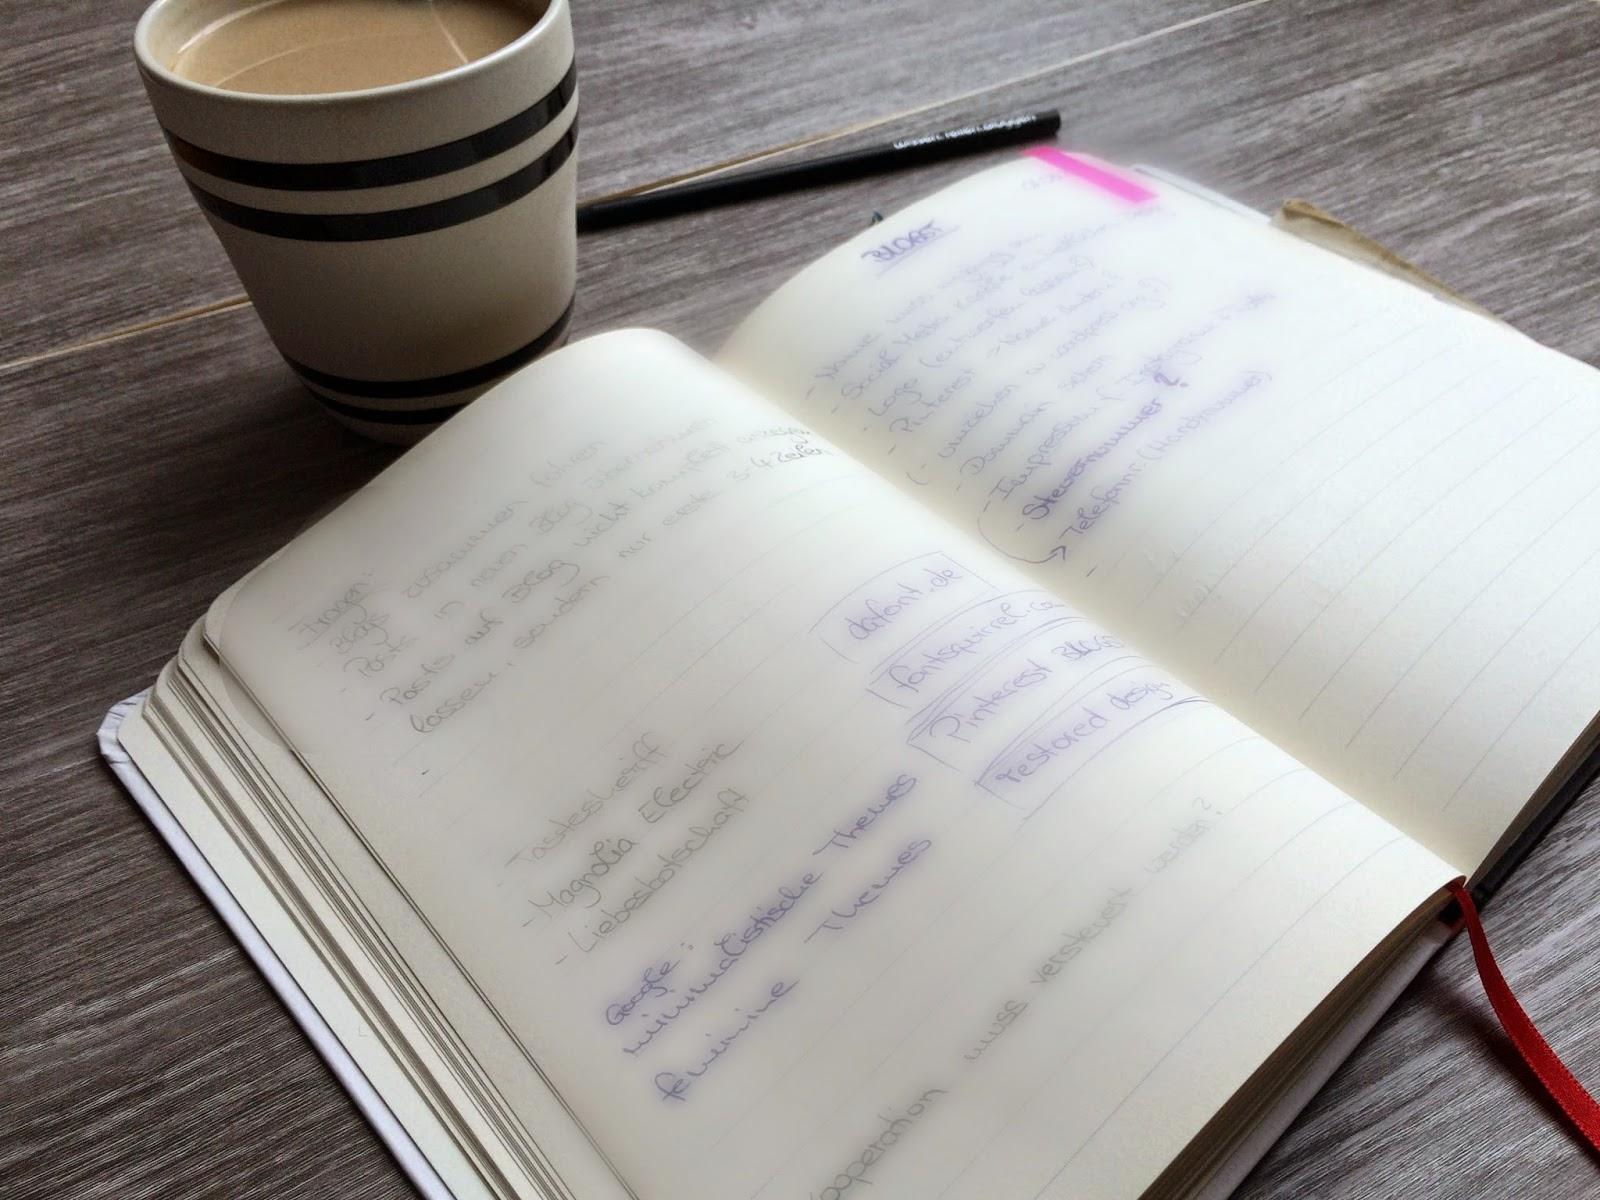 Kaffeetasse Notizbuch Bleistift